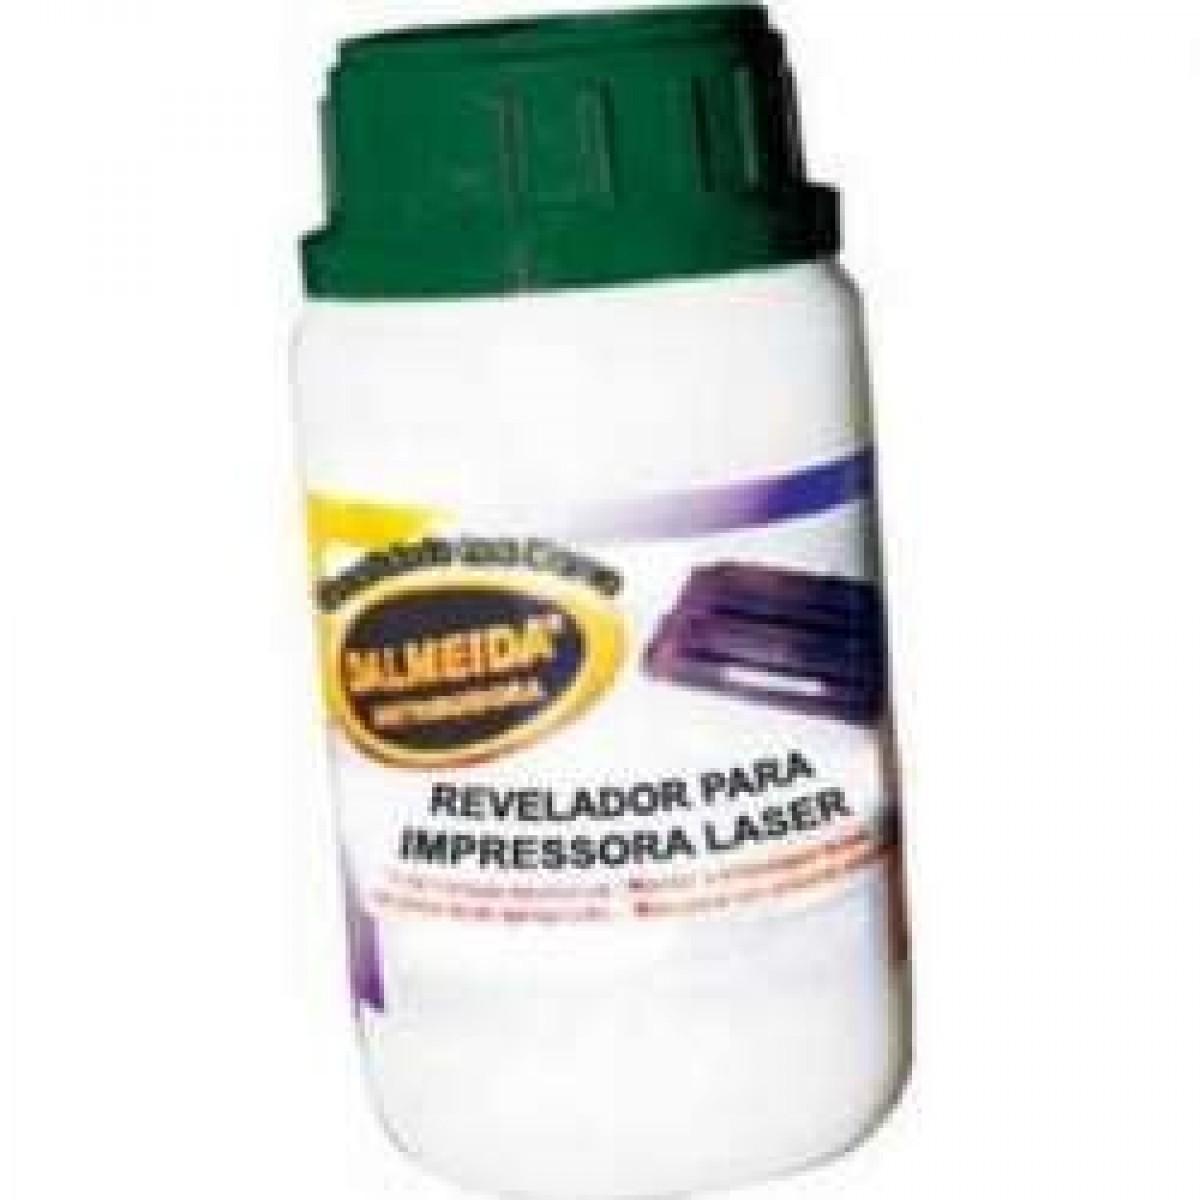 REVELADOR XEROX XD100/SHARP AL 1000